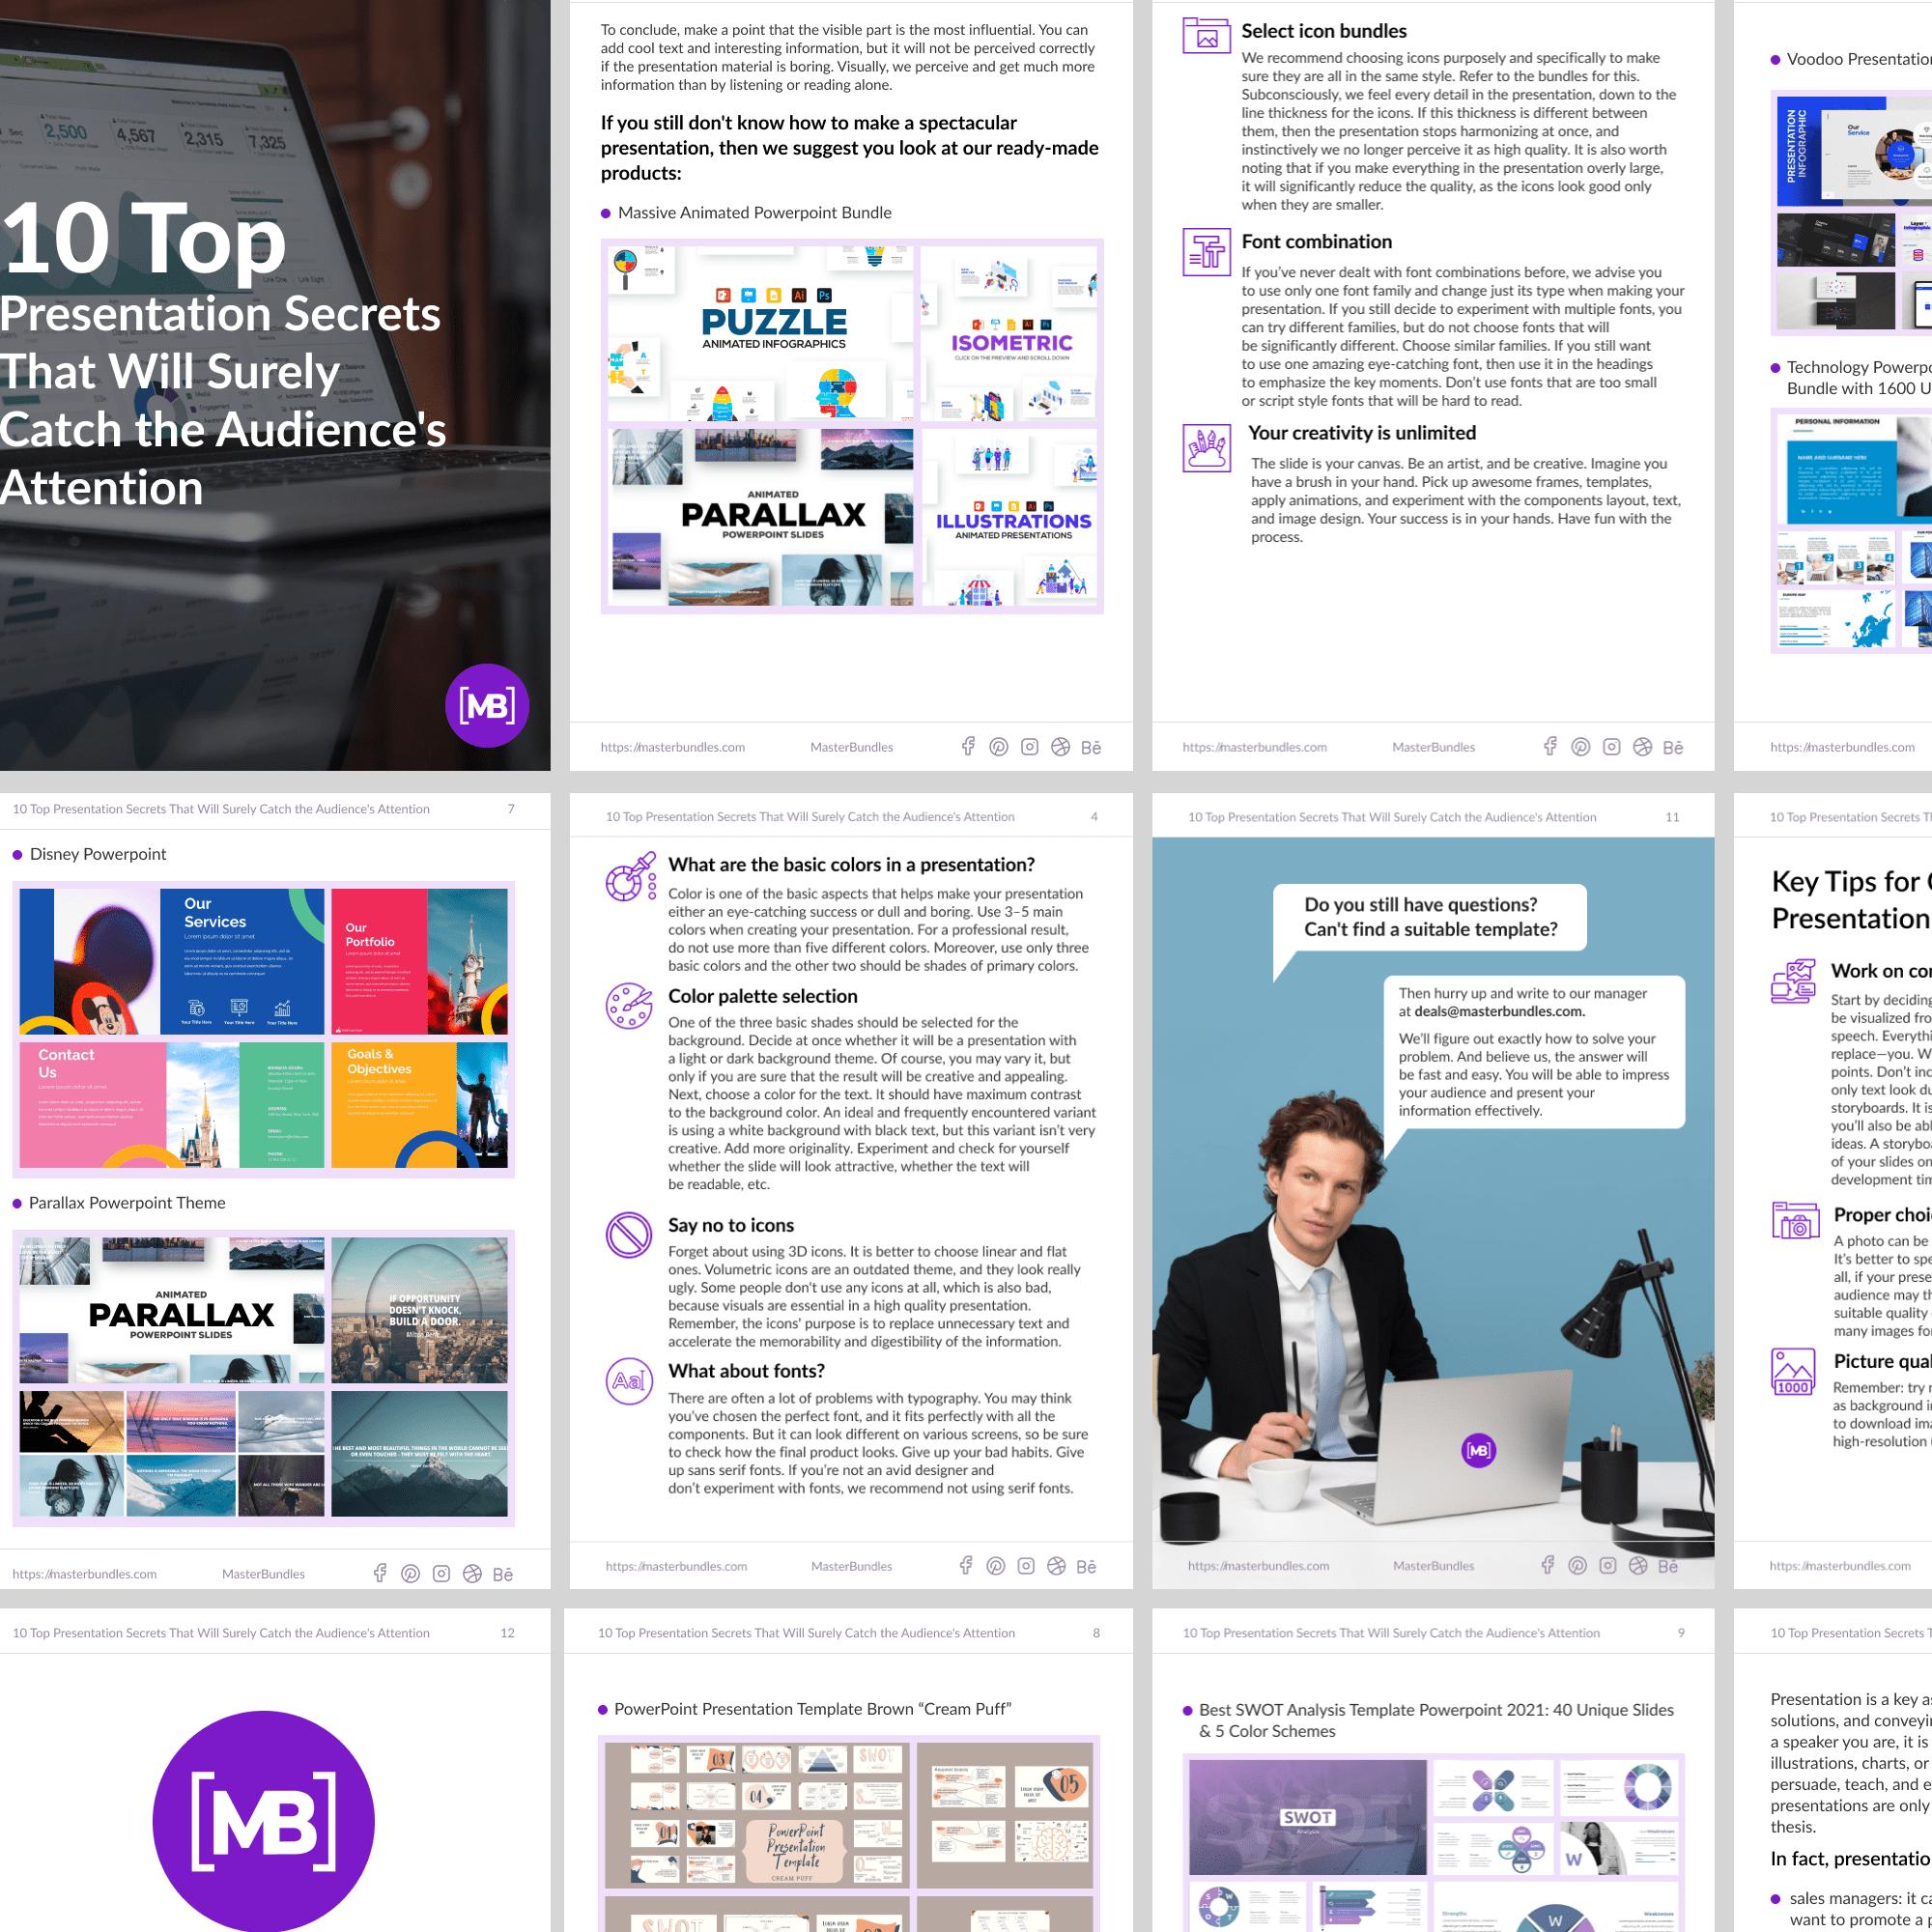 Free White Paper: 10 Top Presentation Secrets. Second cover image.